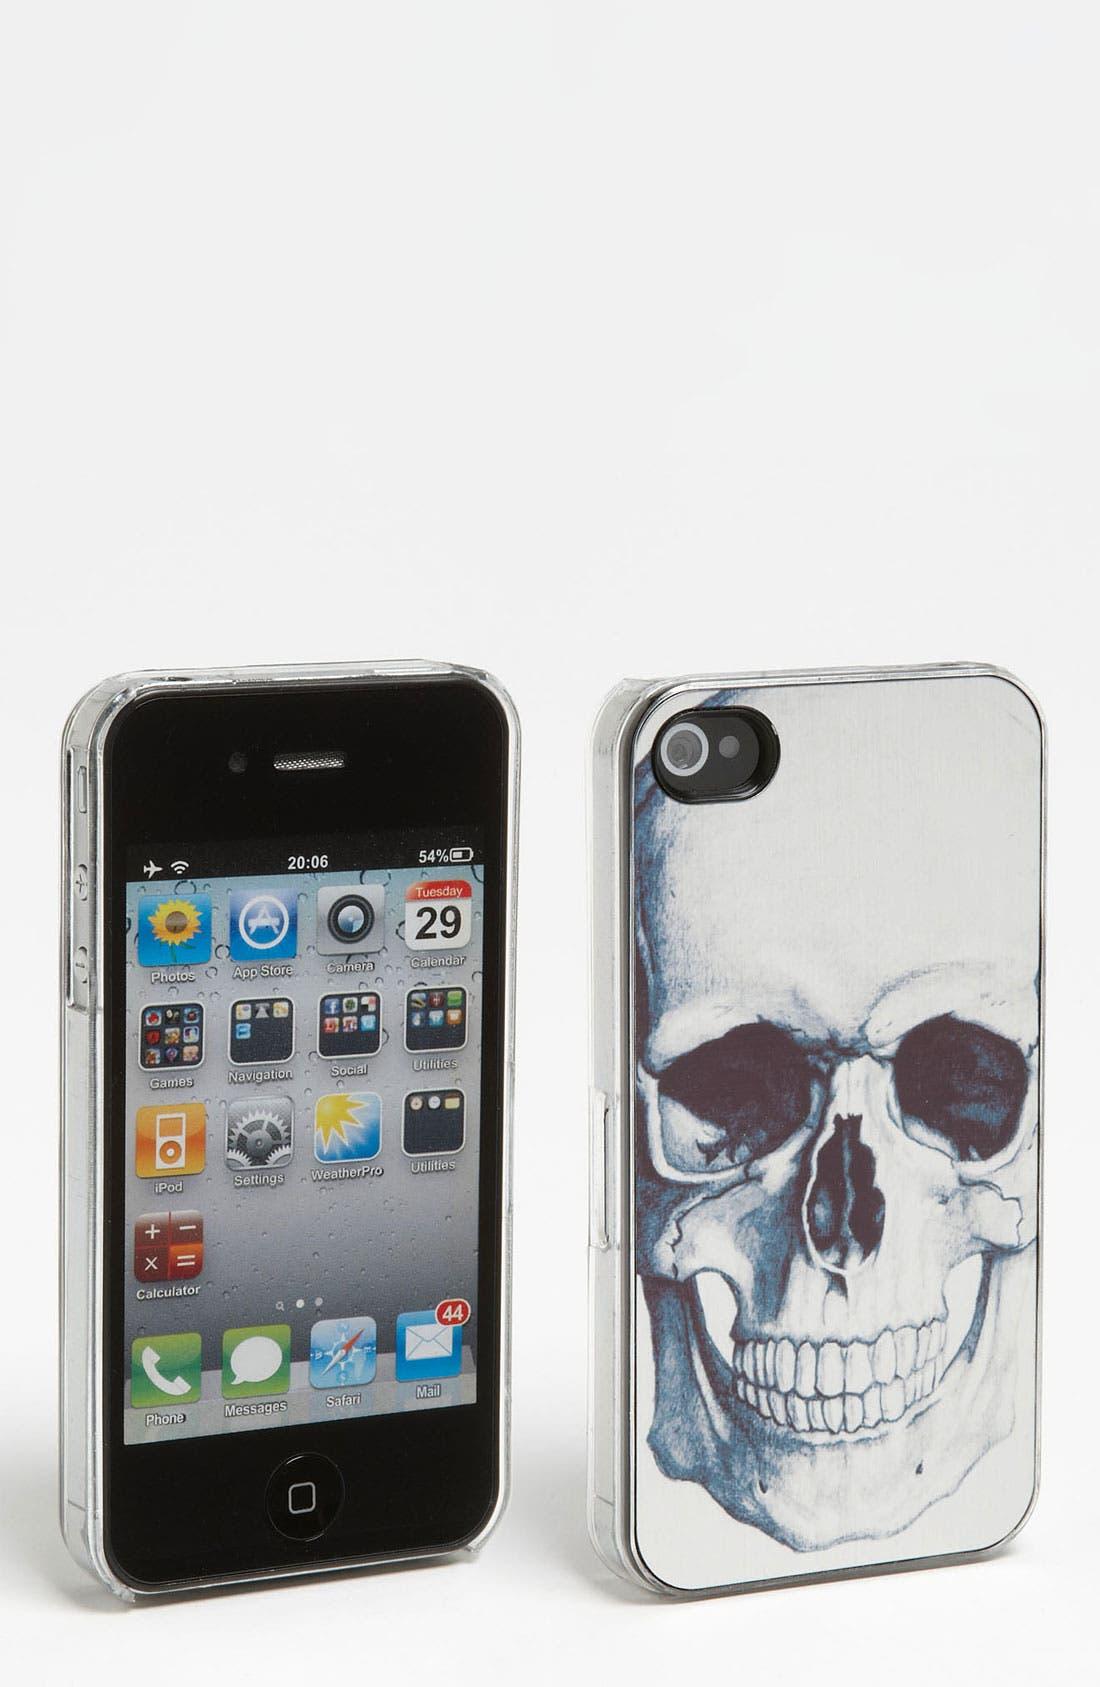 Main Image - ZERO GRAVITY iPhone 4 & 4S Case